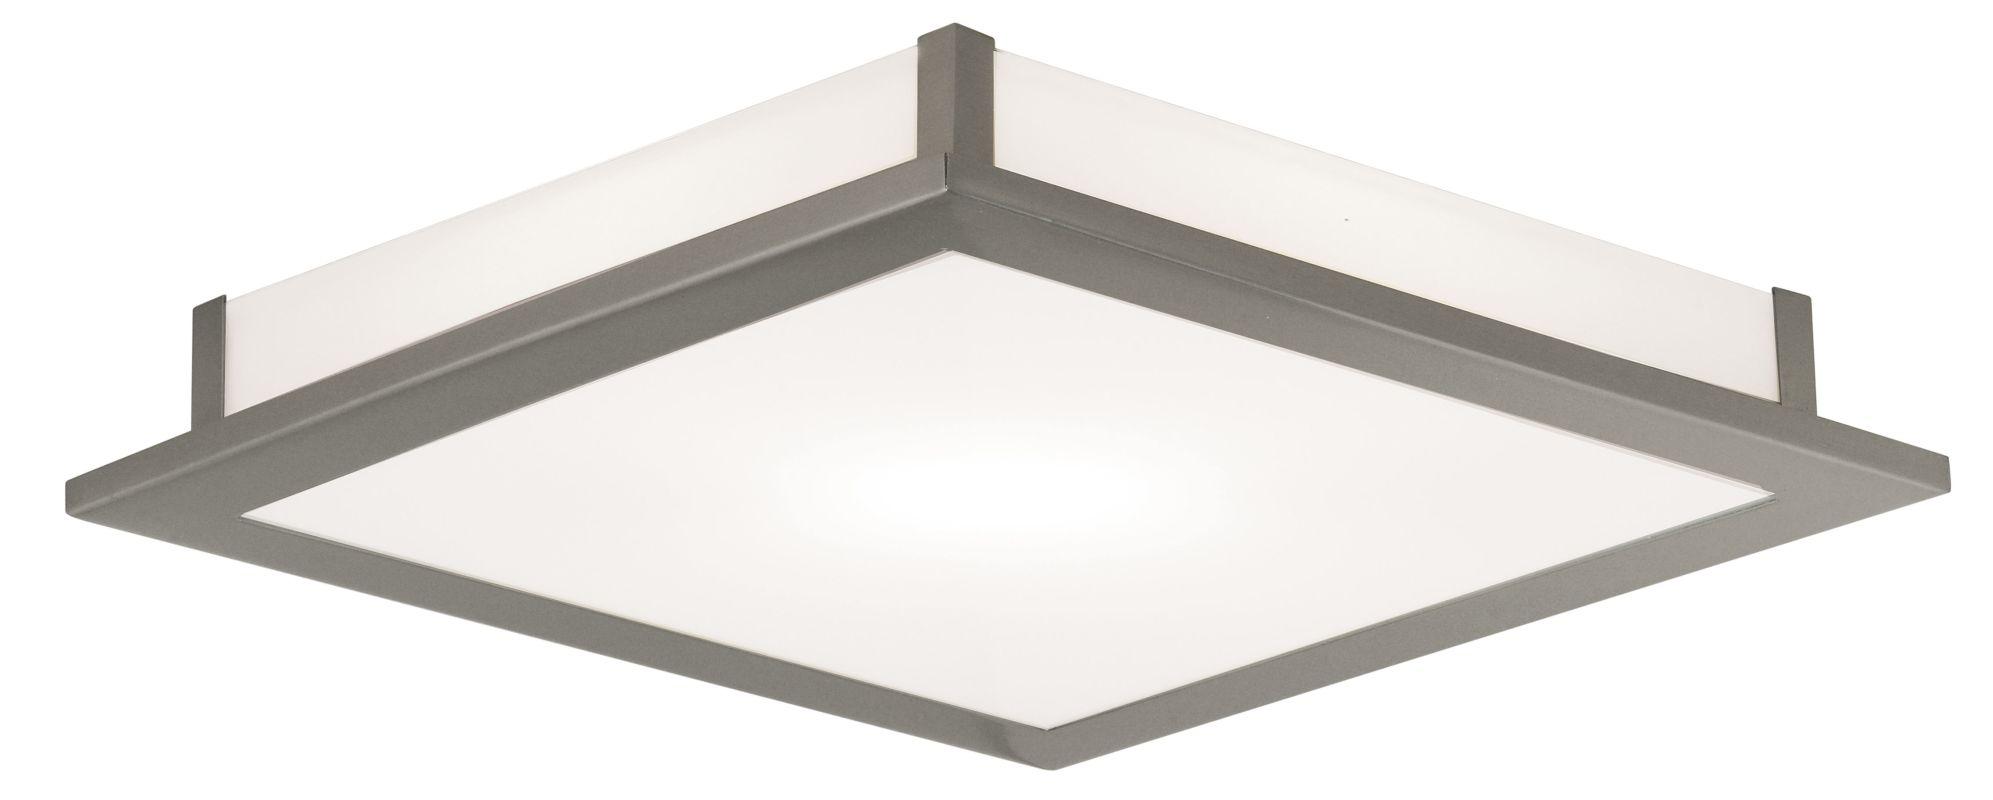 Eglo 86239 Auriga Single-Light Semi-Flush Fixture Matte Nickel Indoor